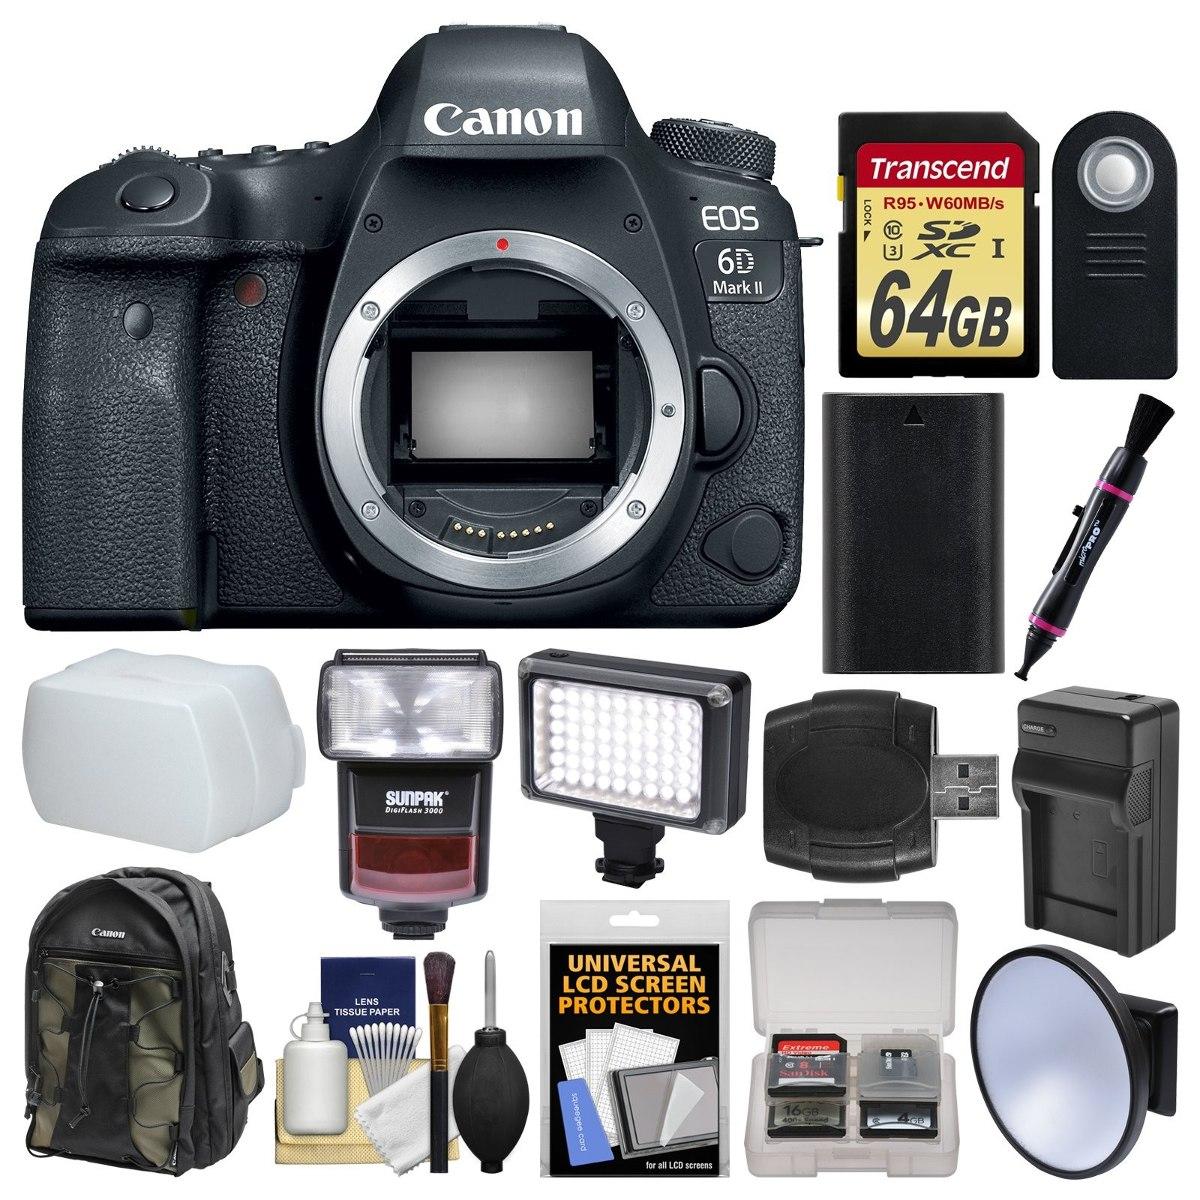 Camara Canon Eos 6d Mark Ii Wi-fi Digital Slr Camera Bod 870 ...